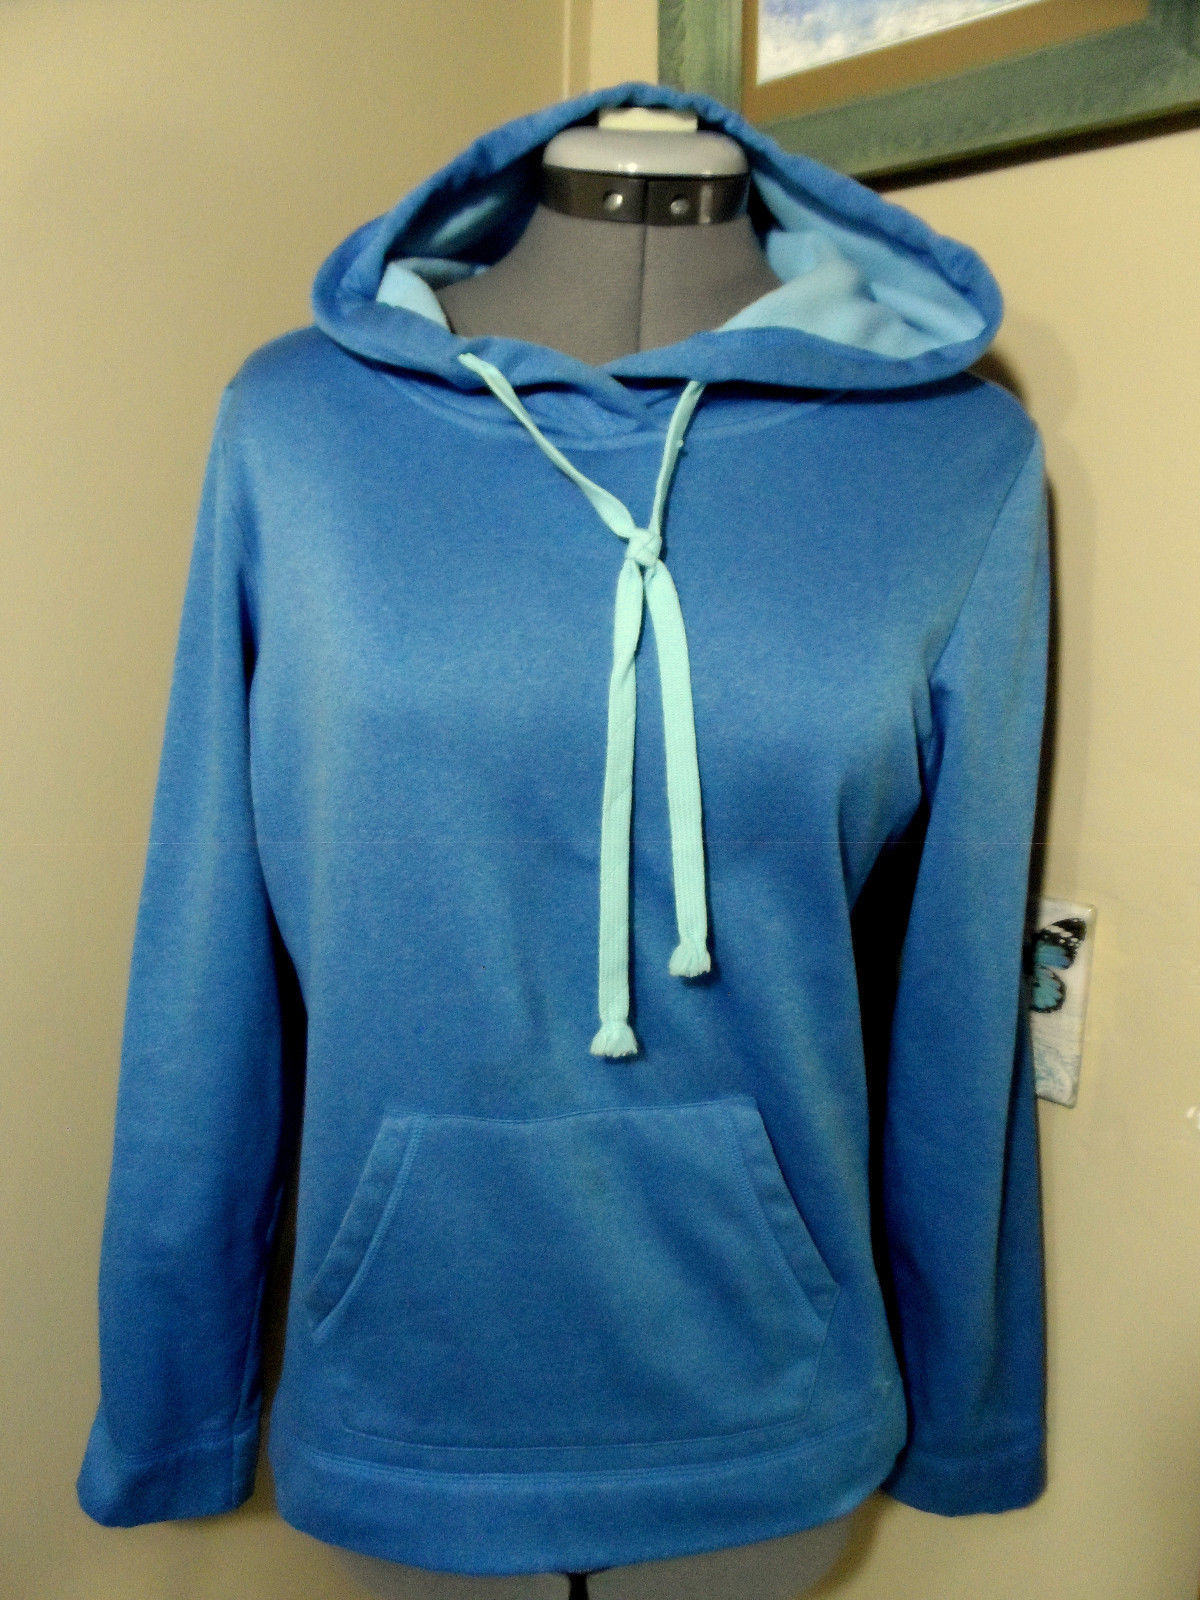 3fd03b8546b S l1600. S l1600. Previous. DANSKIN NOW Hoodie Sweatshirt S Heather Blue  fleece Pullover Sport Athletic Yoga